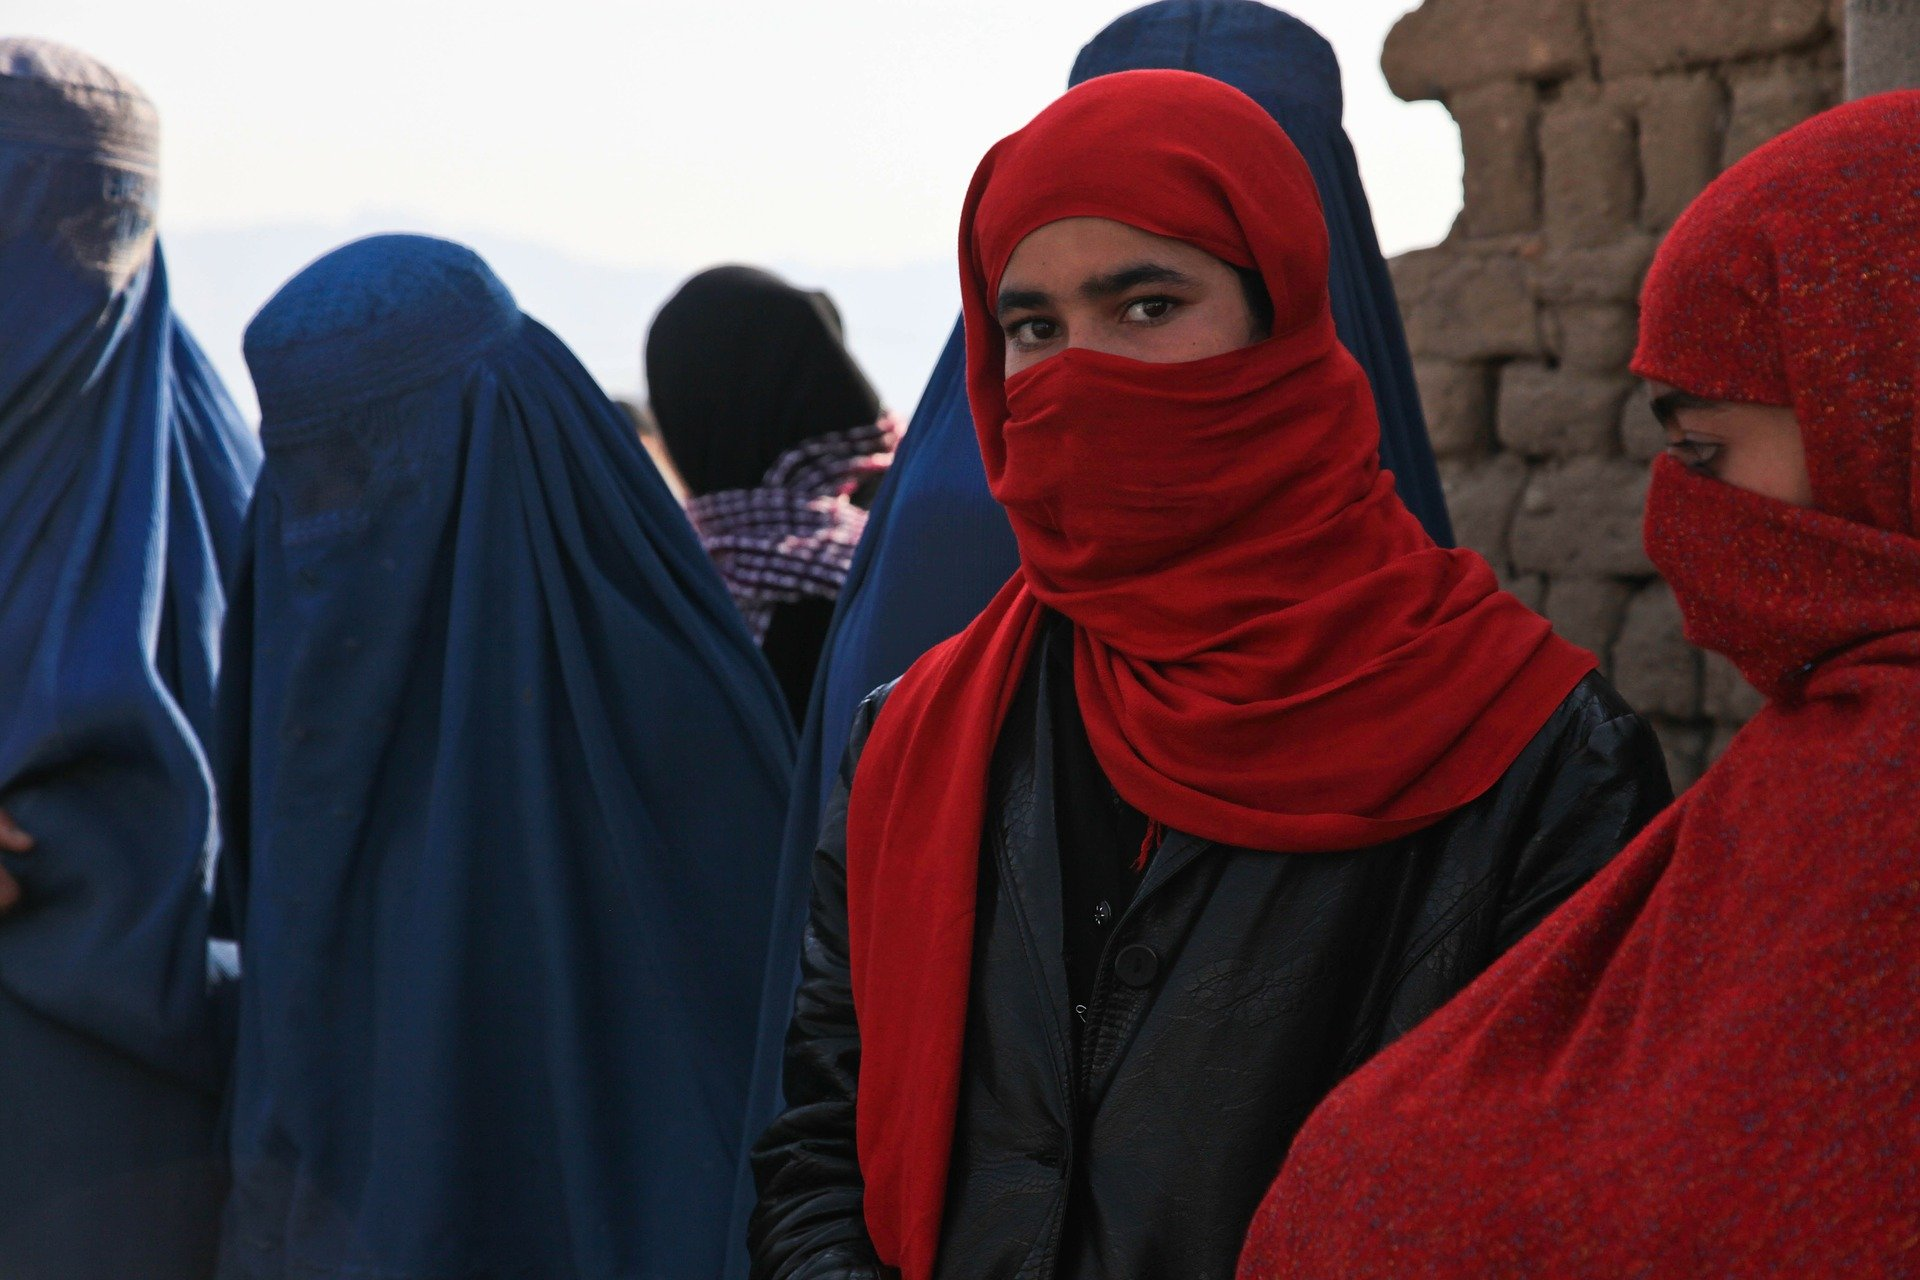 Taliban rule may push Afghans away from Islam